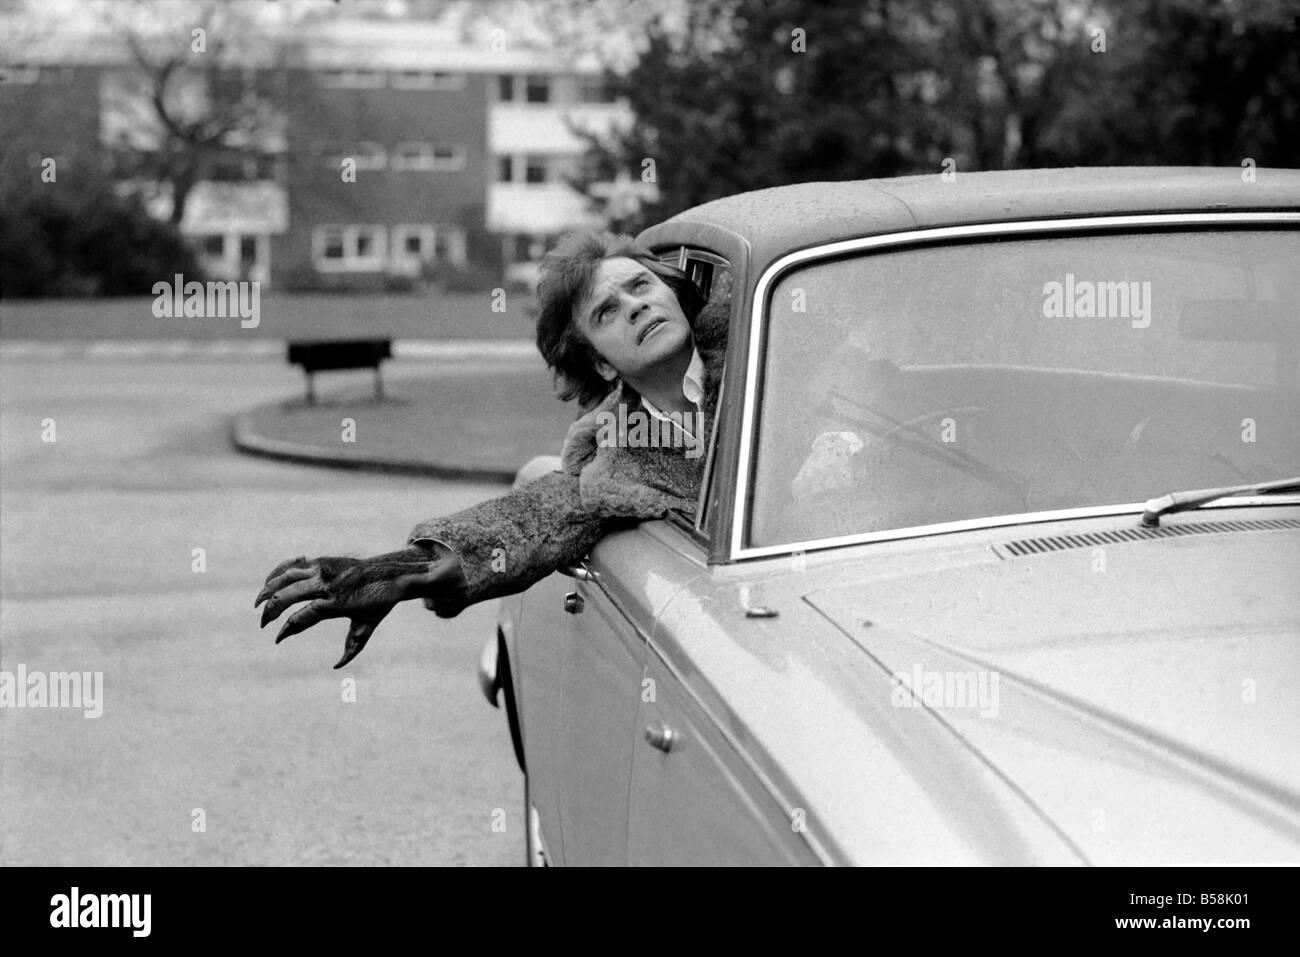 Humour Comedy Car Comedian Freddie Starr March 1975 75 01555